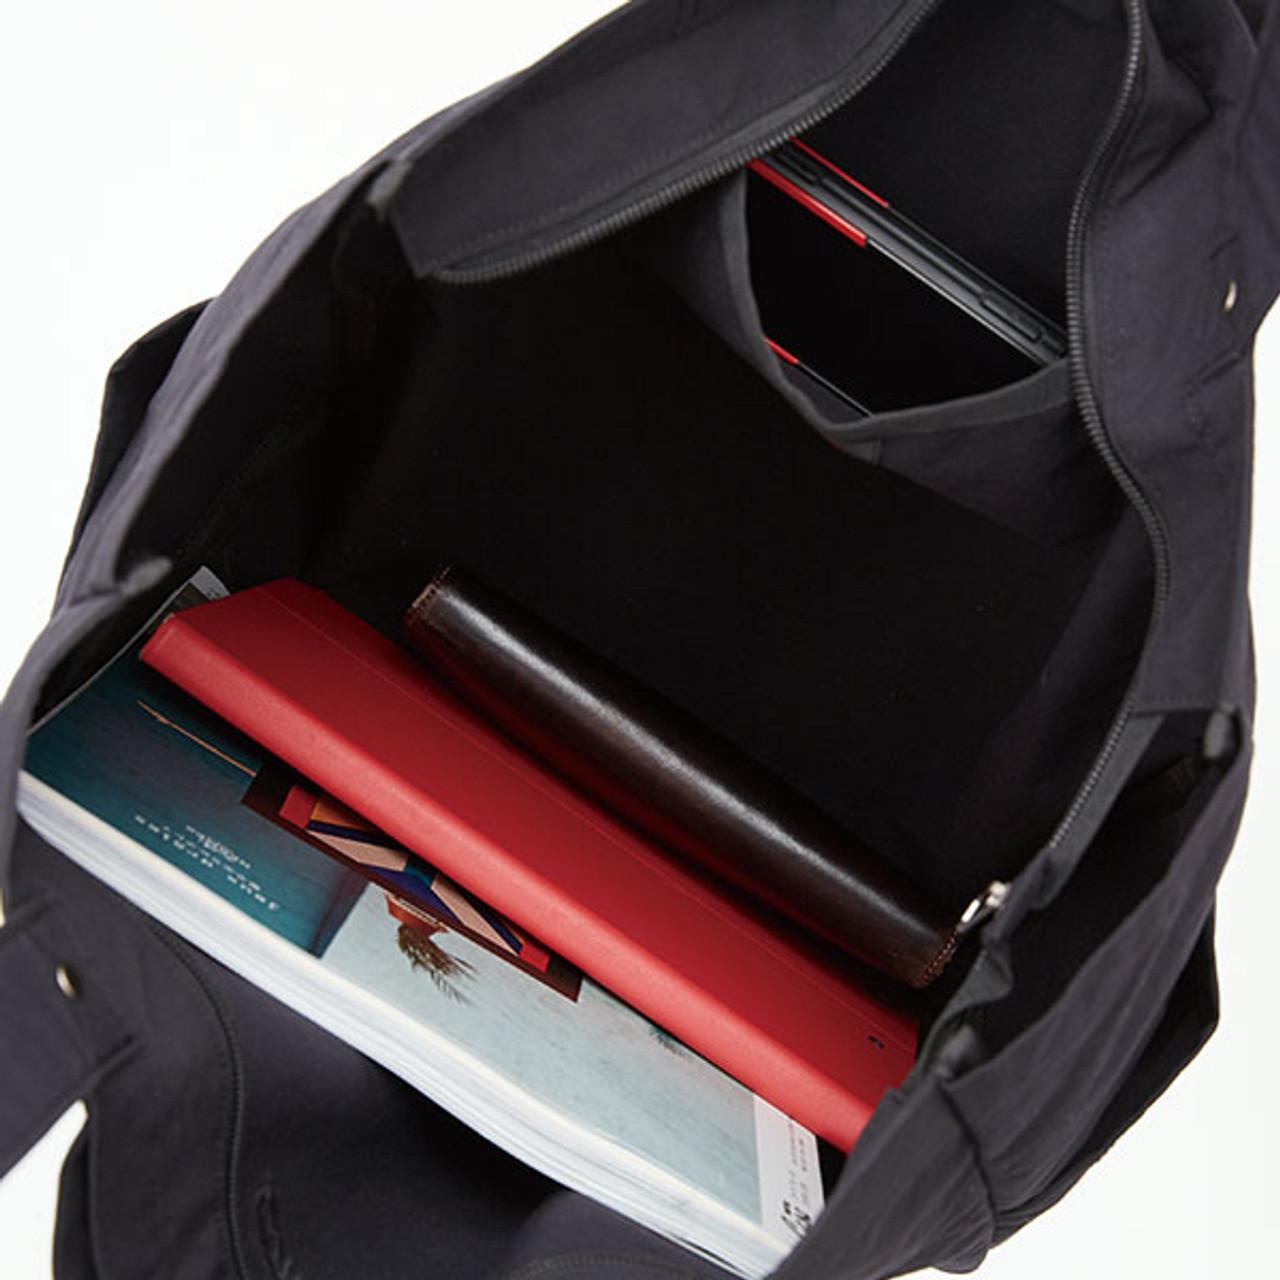 STSG18000700 STI Tote Bag Examples at AVOJDM.com